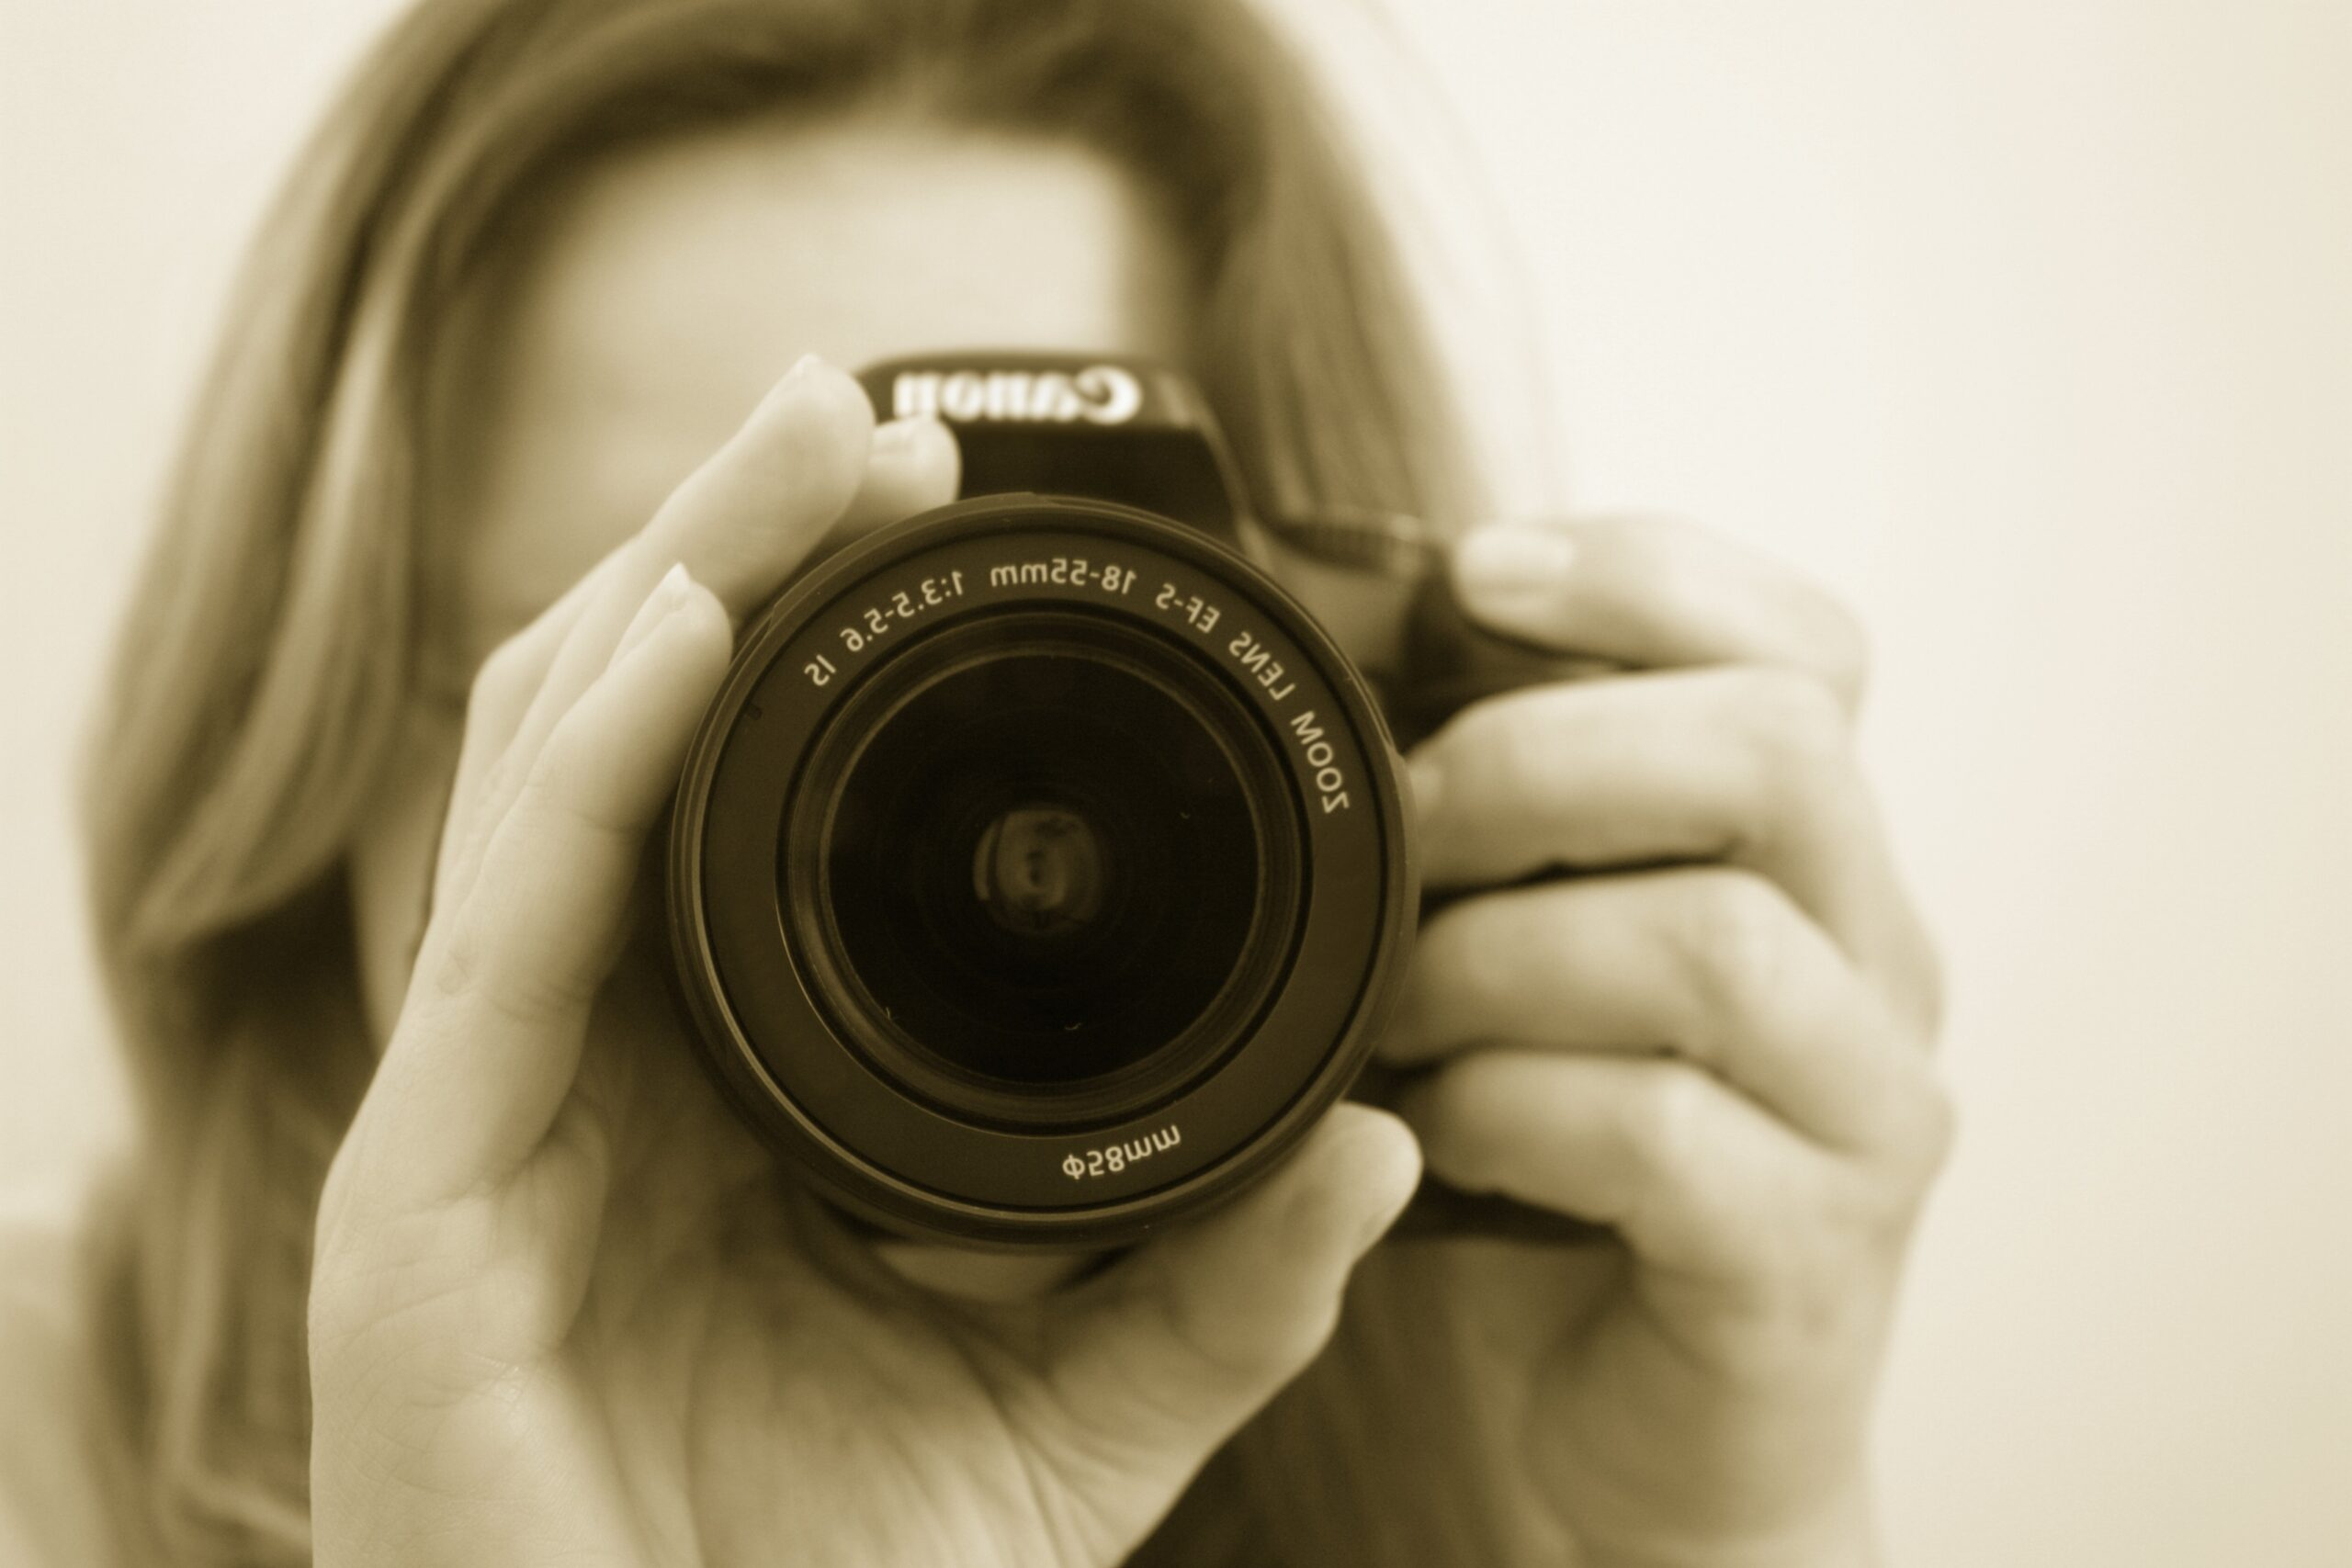 Top 5 digital camera